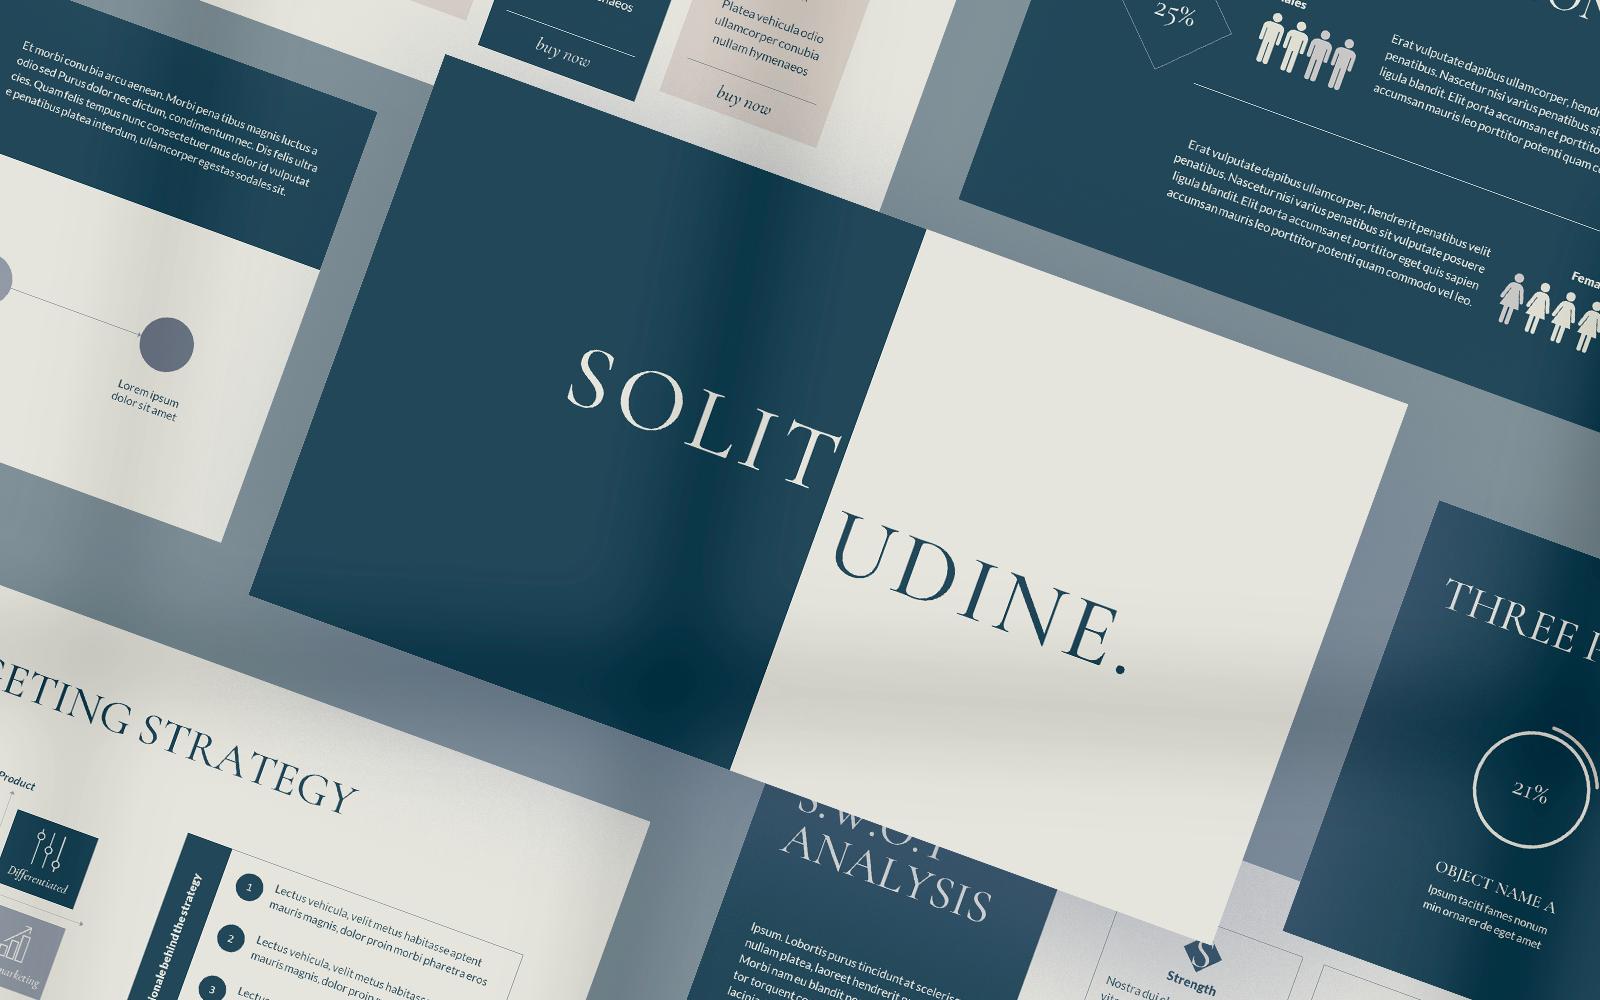 Solitudine - Business Plan PowerPoint Template